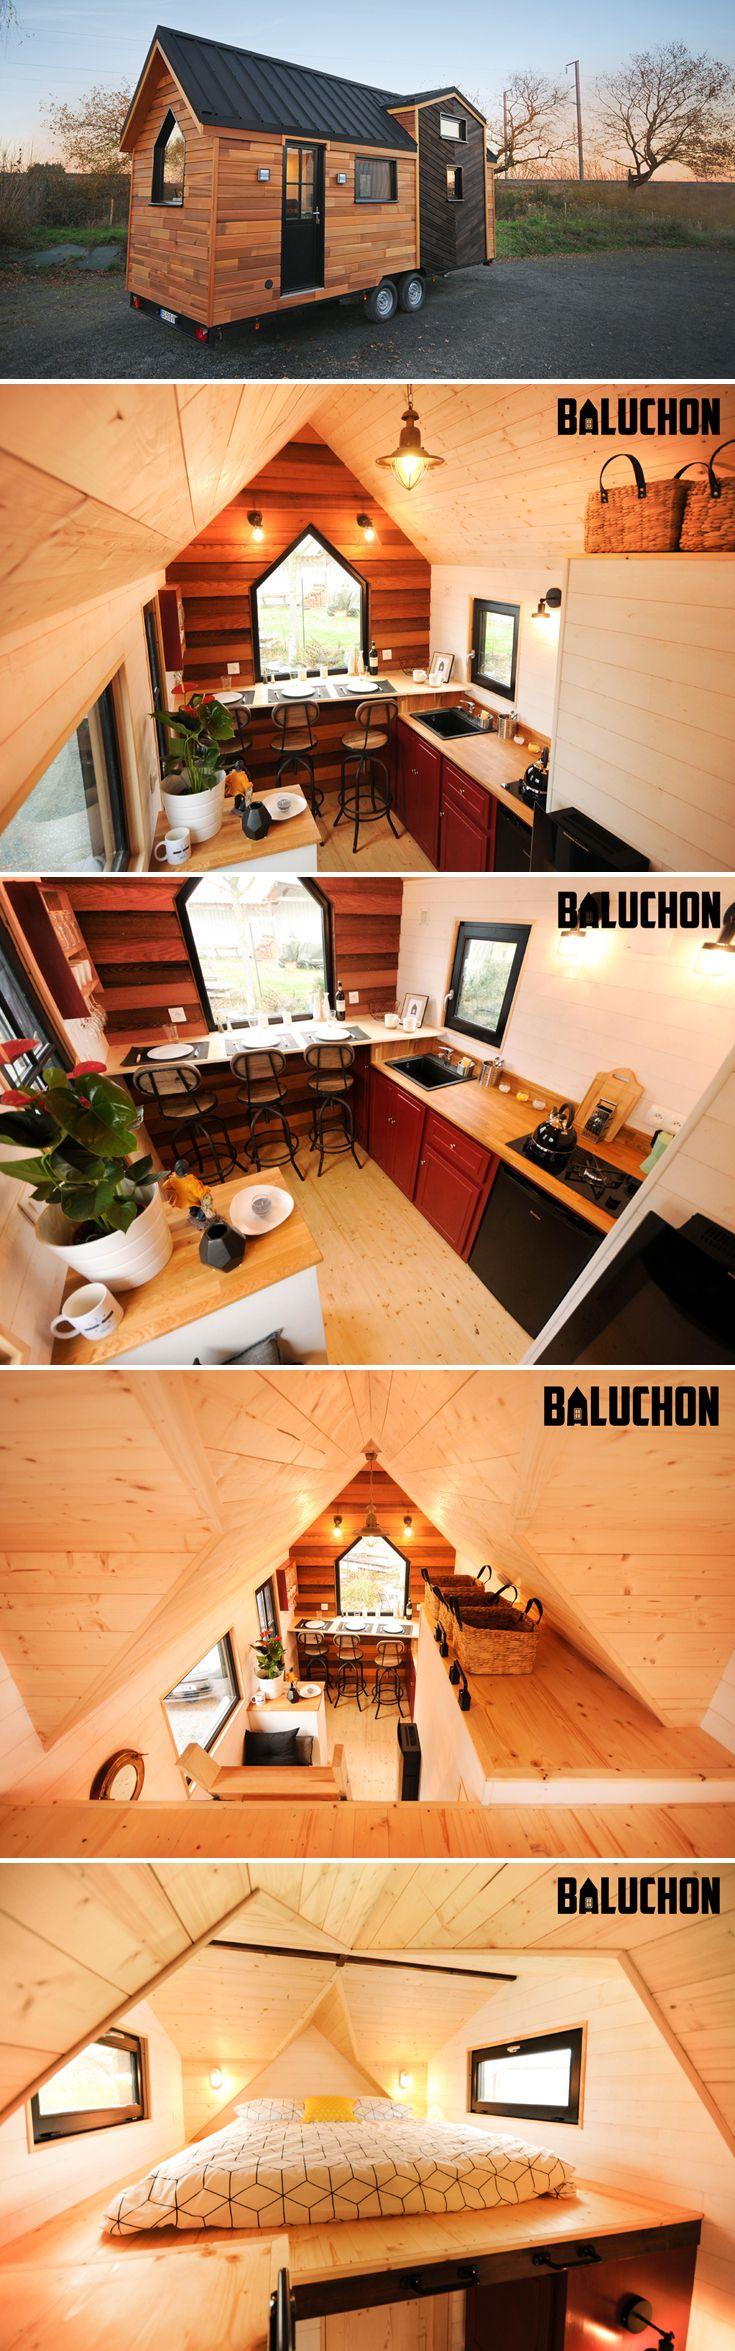 Calypso Home Furniture Calypso By Baluchon House Building Nantes And Tiny Houses